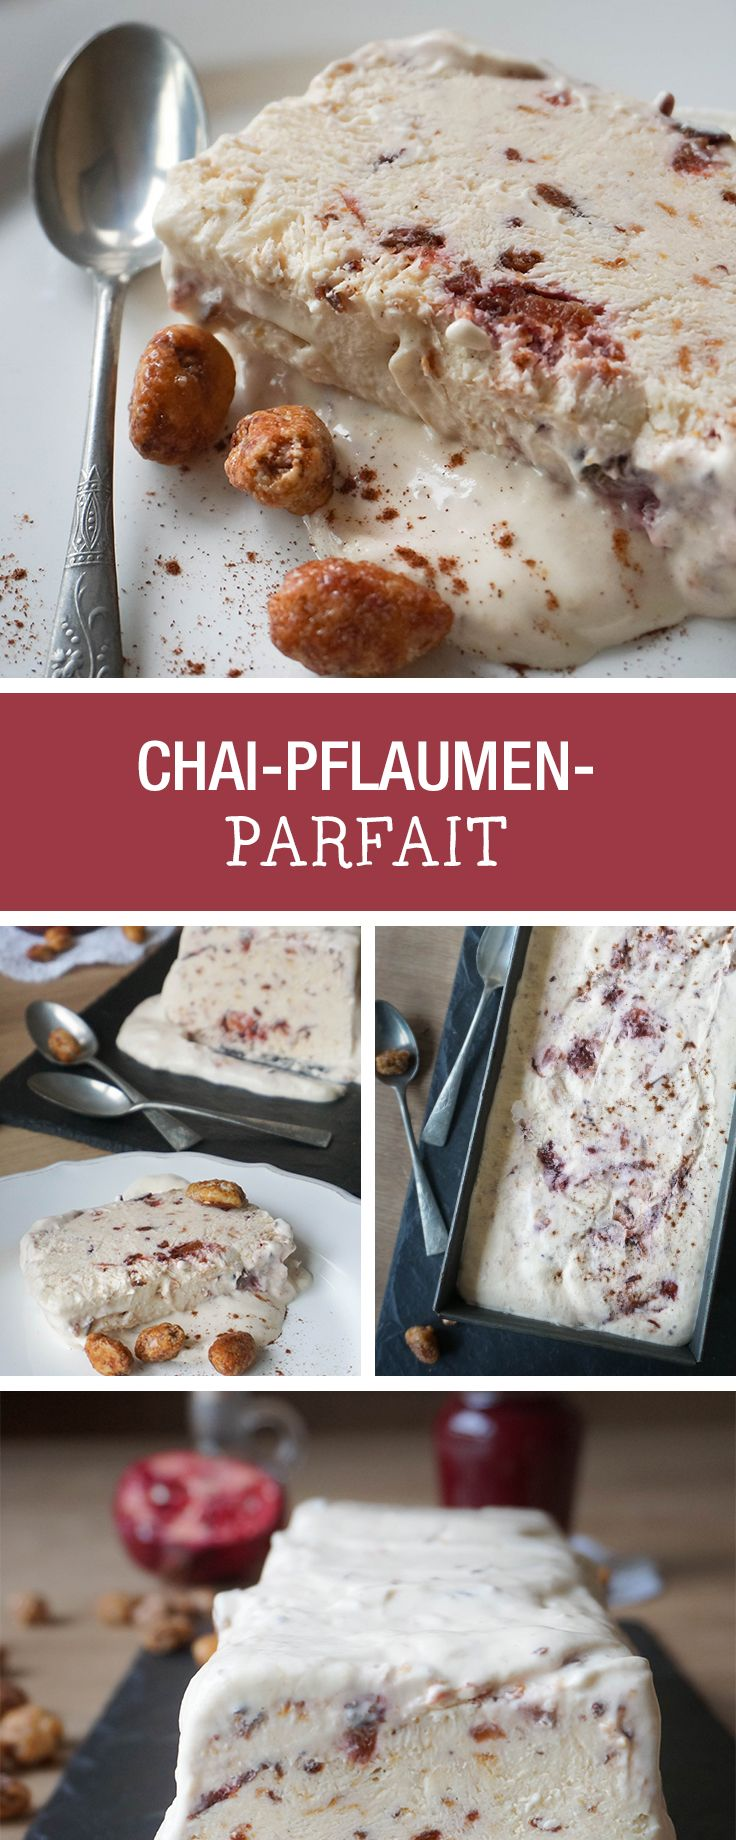 Süßes Rezept für die Weihnachtsparty: Parfait mit Chai-Pflaumen / christmas recipes: parfait with chai plums via DaWanda.com